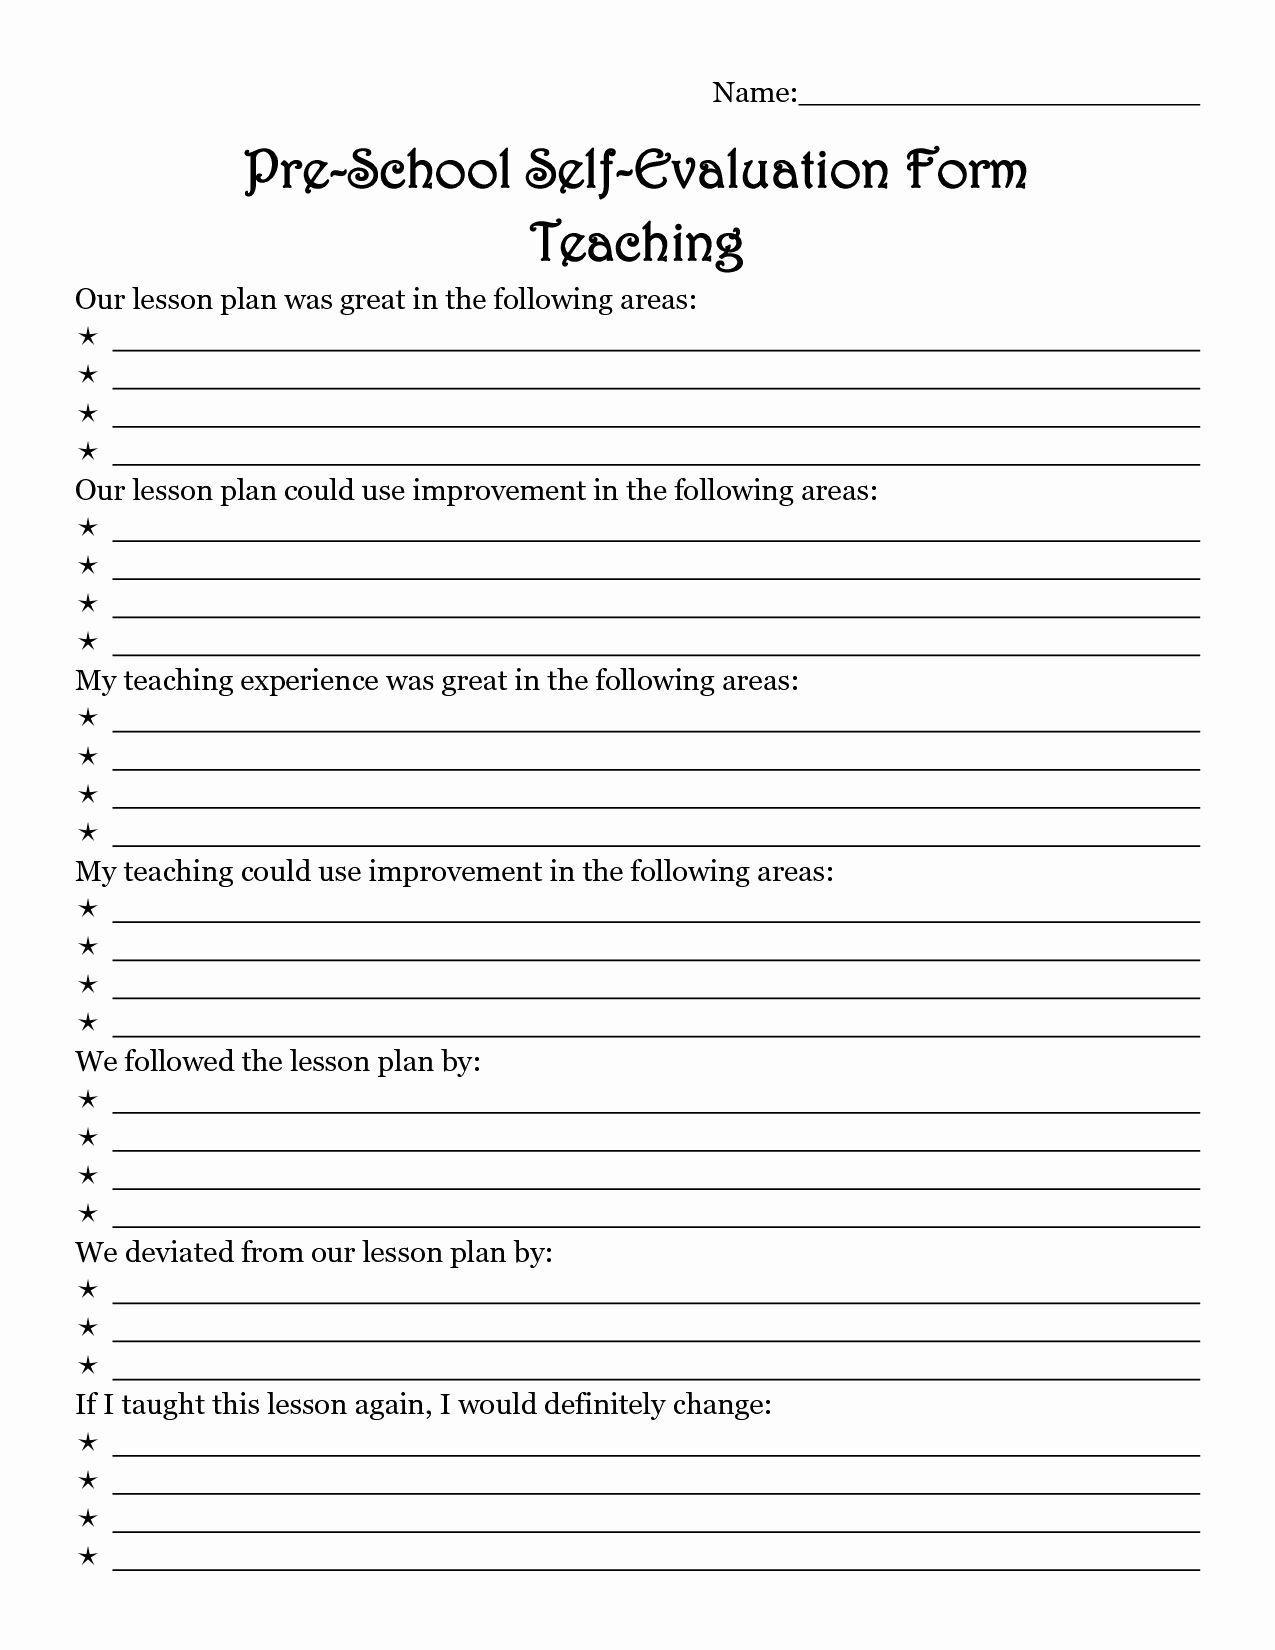 Teacher Application Forms Inspirational Teacher Evaluation